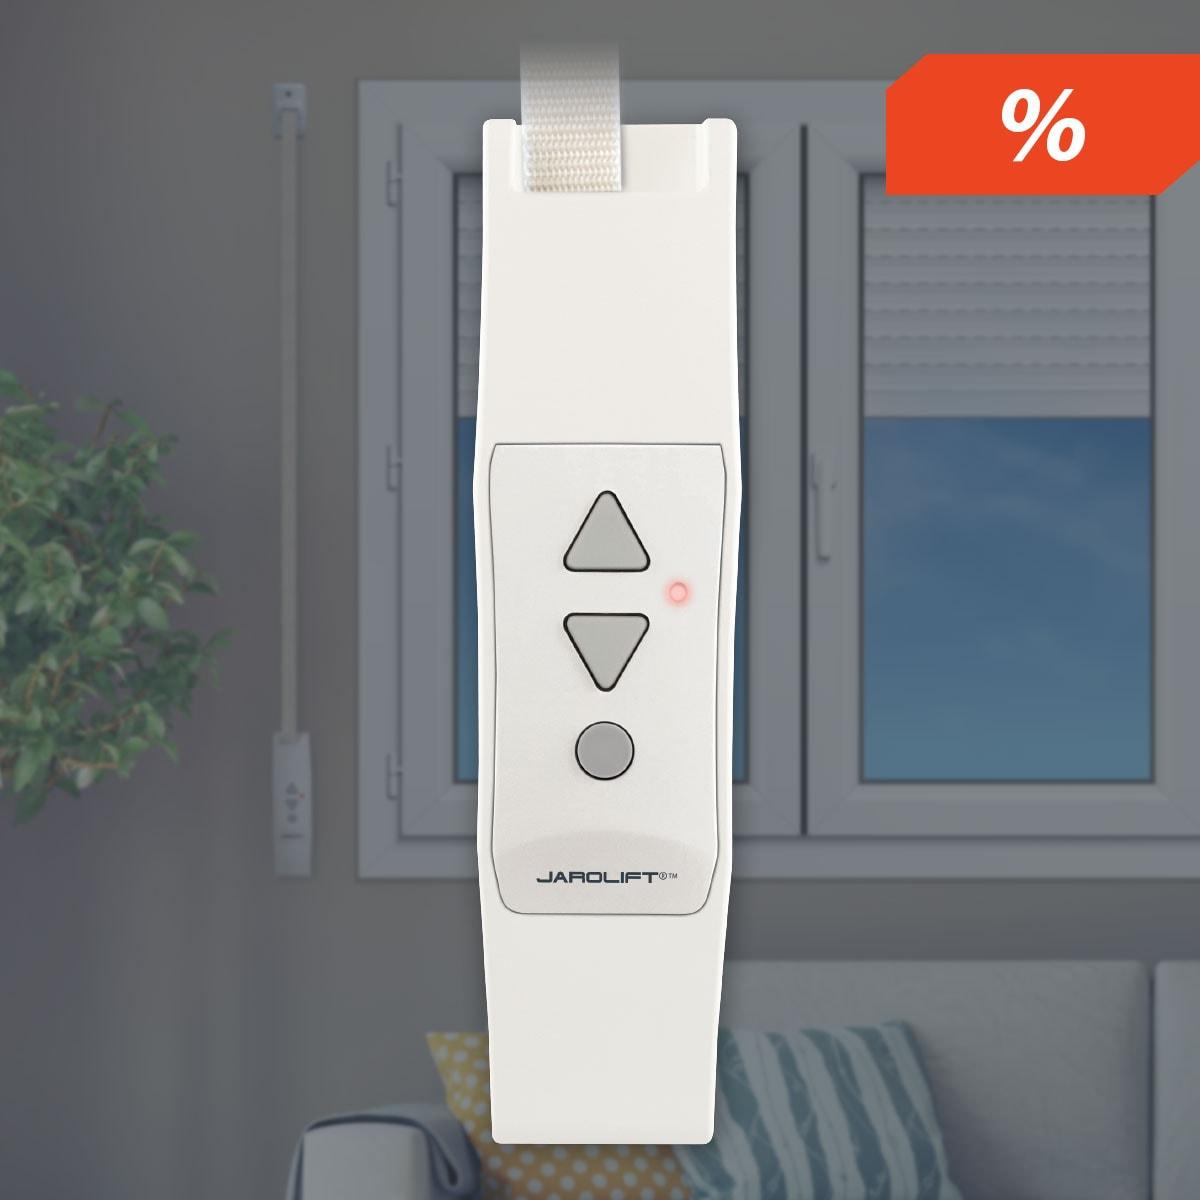 rollladen vorbaurollladen rollladenbehang rollladenzubeh r. Black Bedroom Furniture Sets. Home Design Ideas